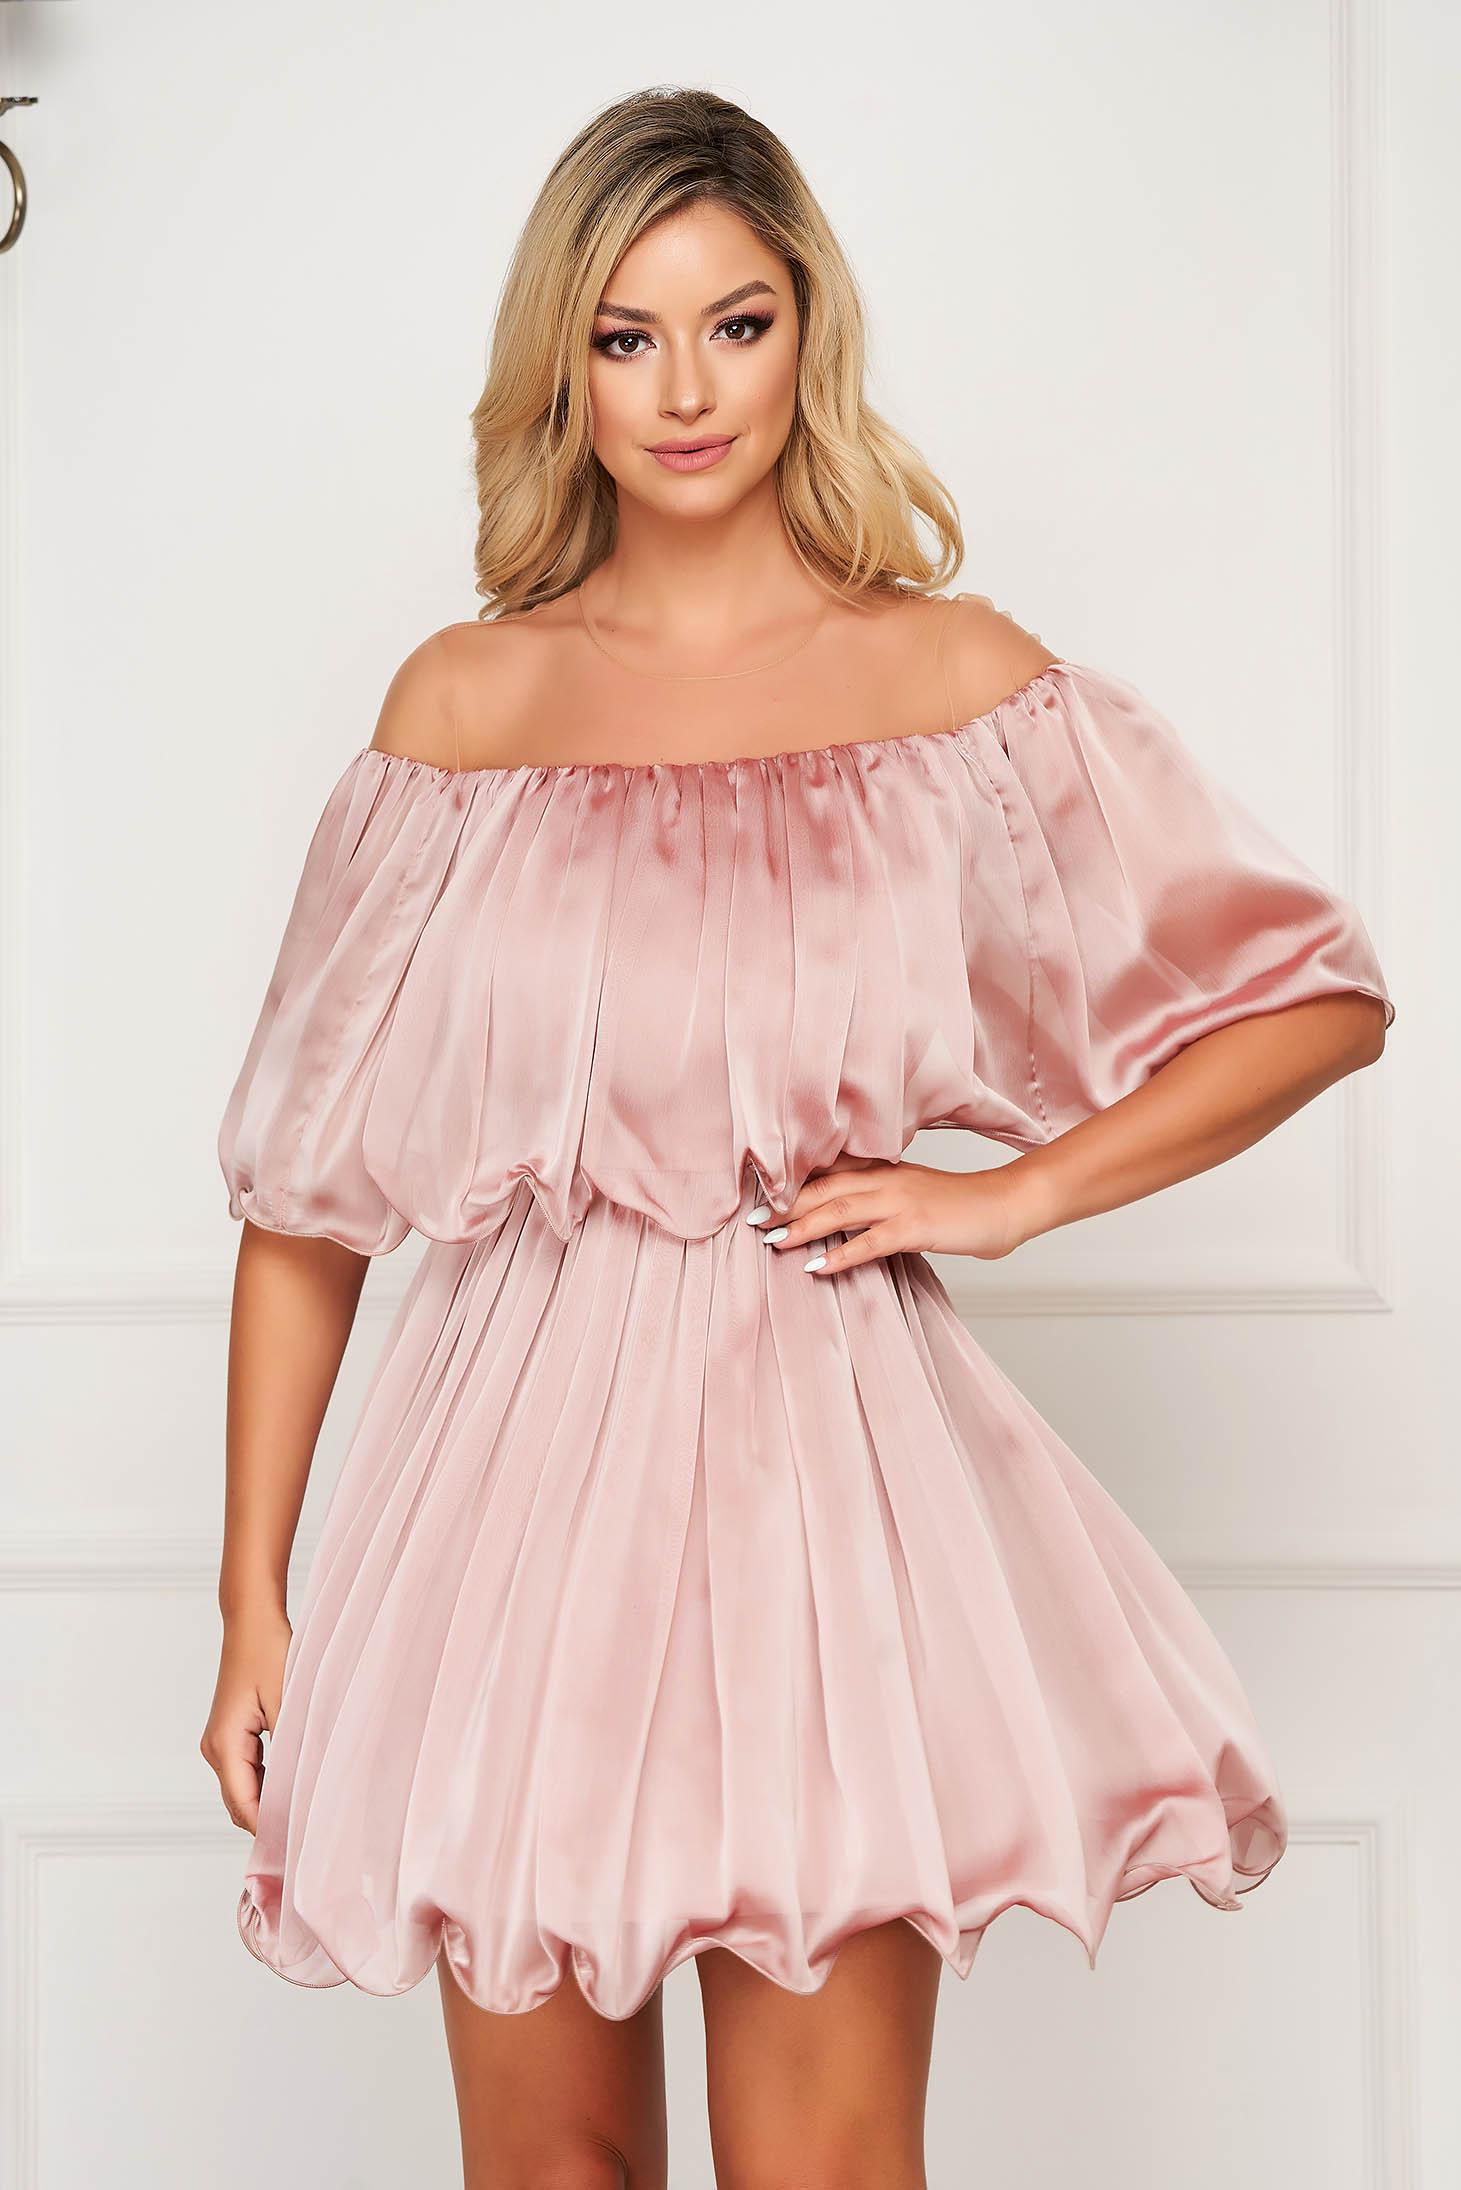 Lightpink dress short cut cloche off-shoulder occasional thin fabric